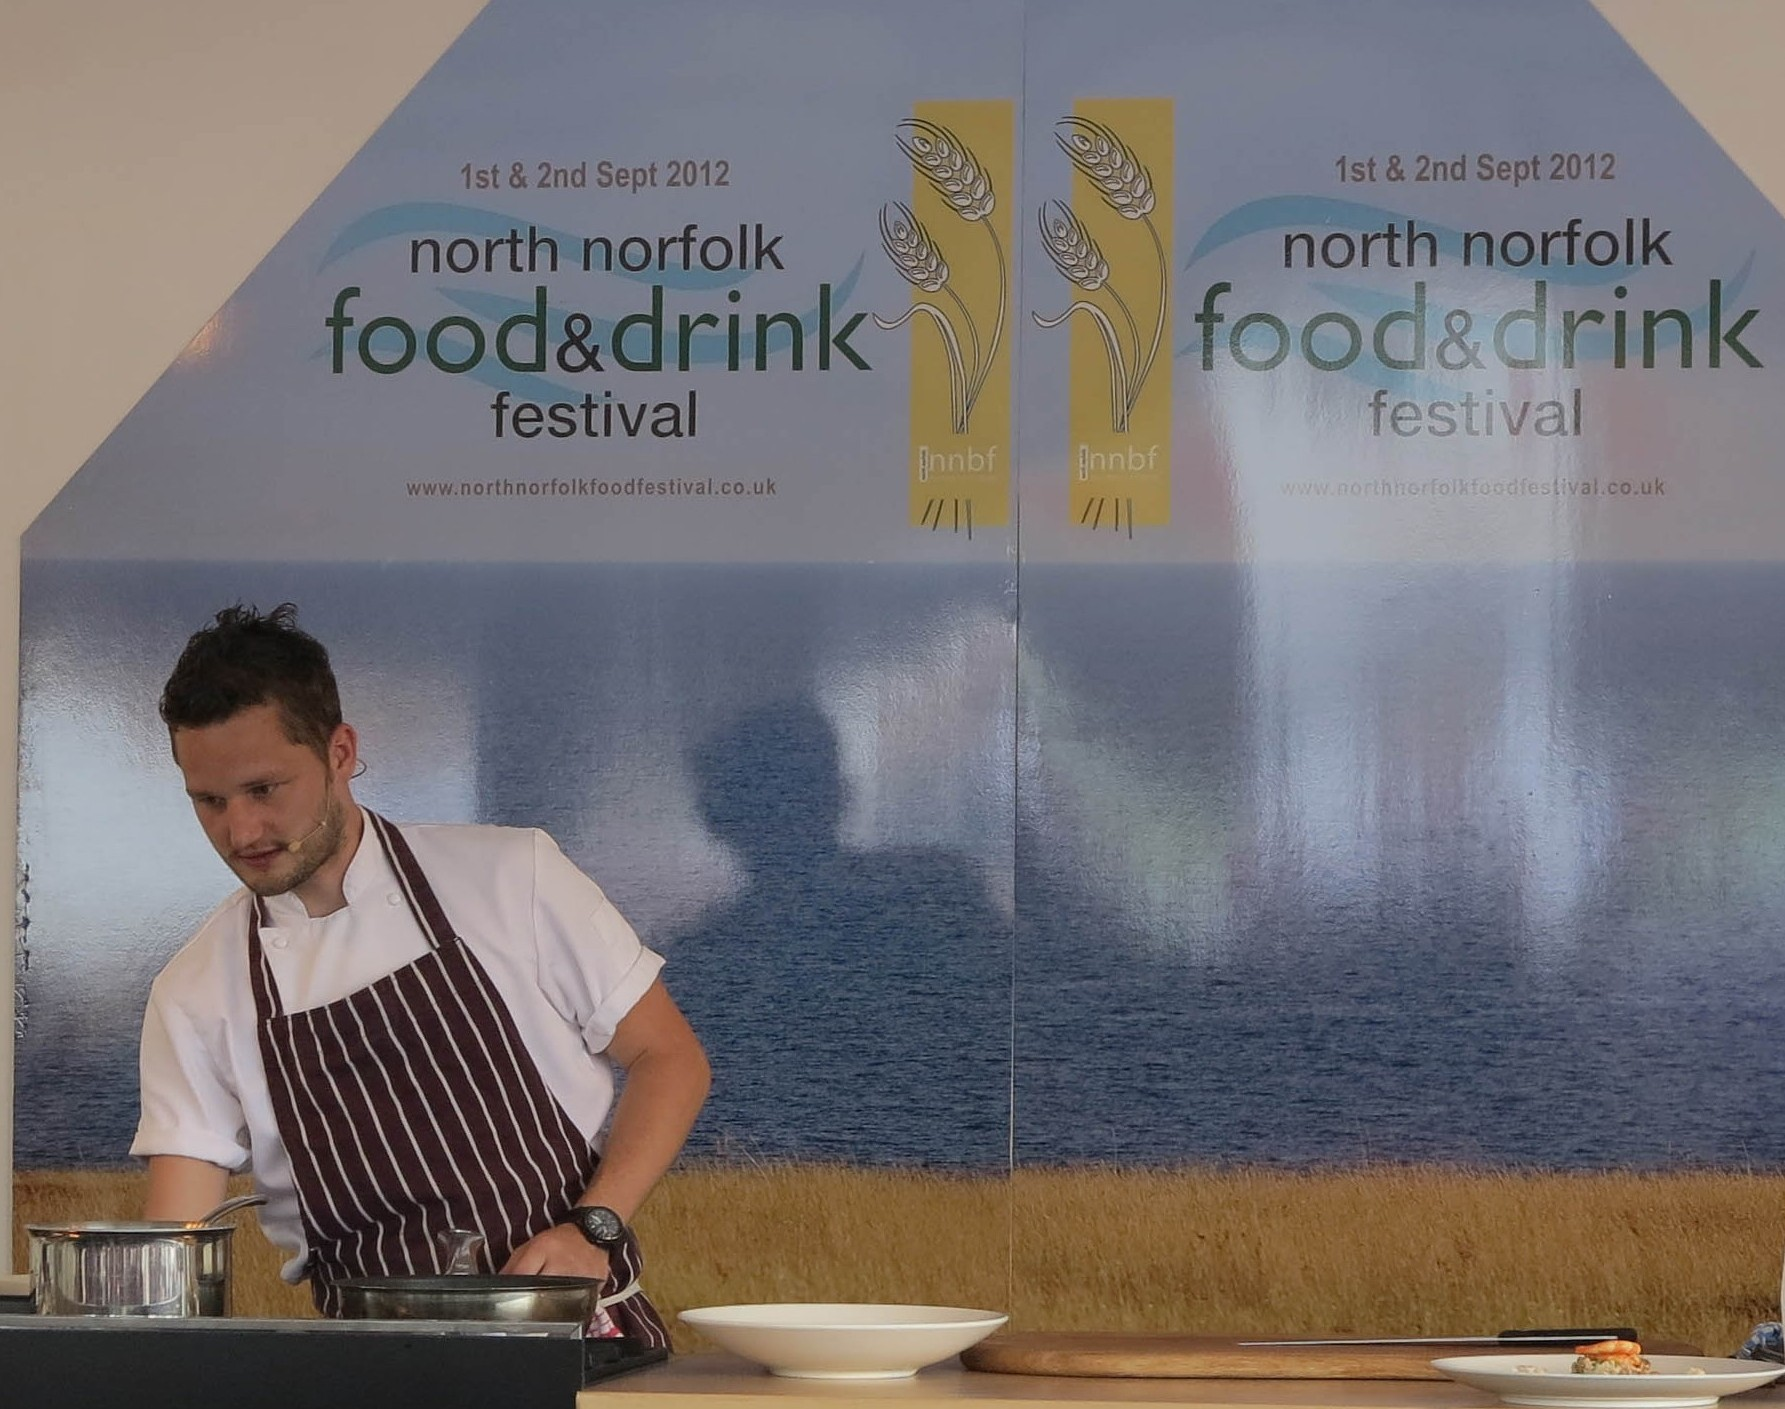 2012 North Norfolk Food & Drink Festival